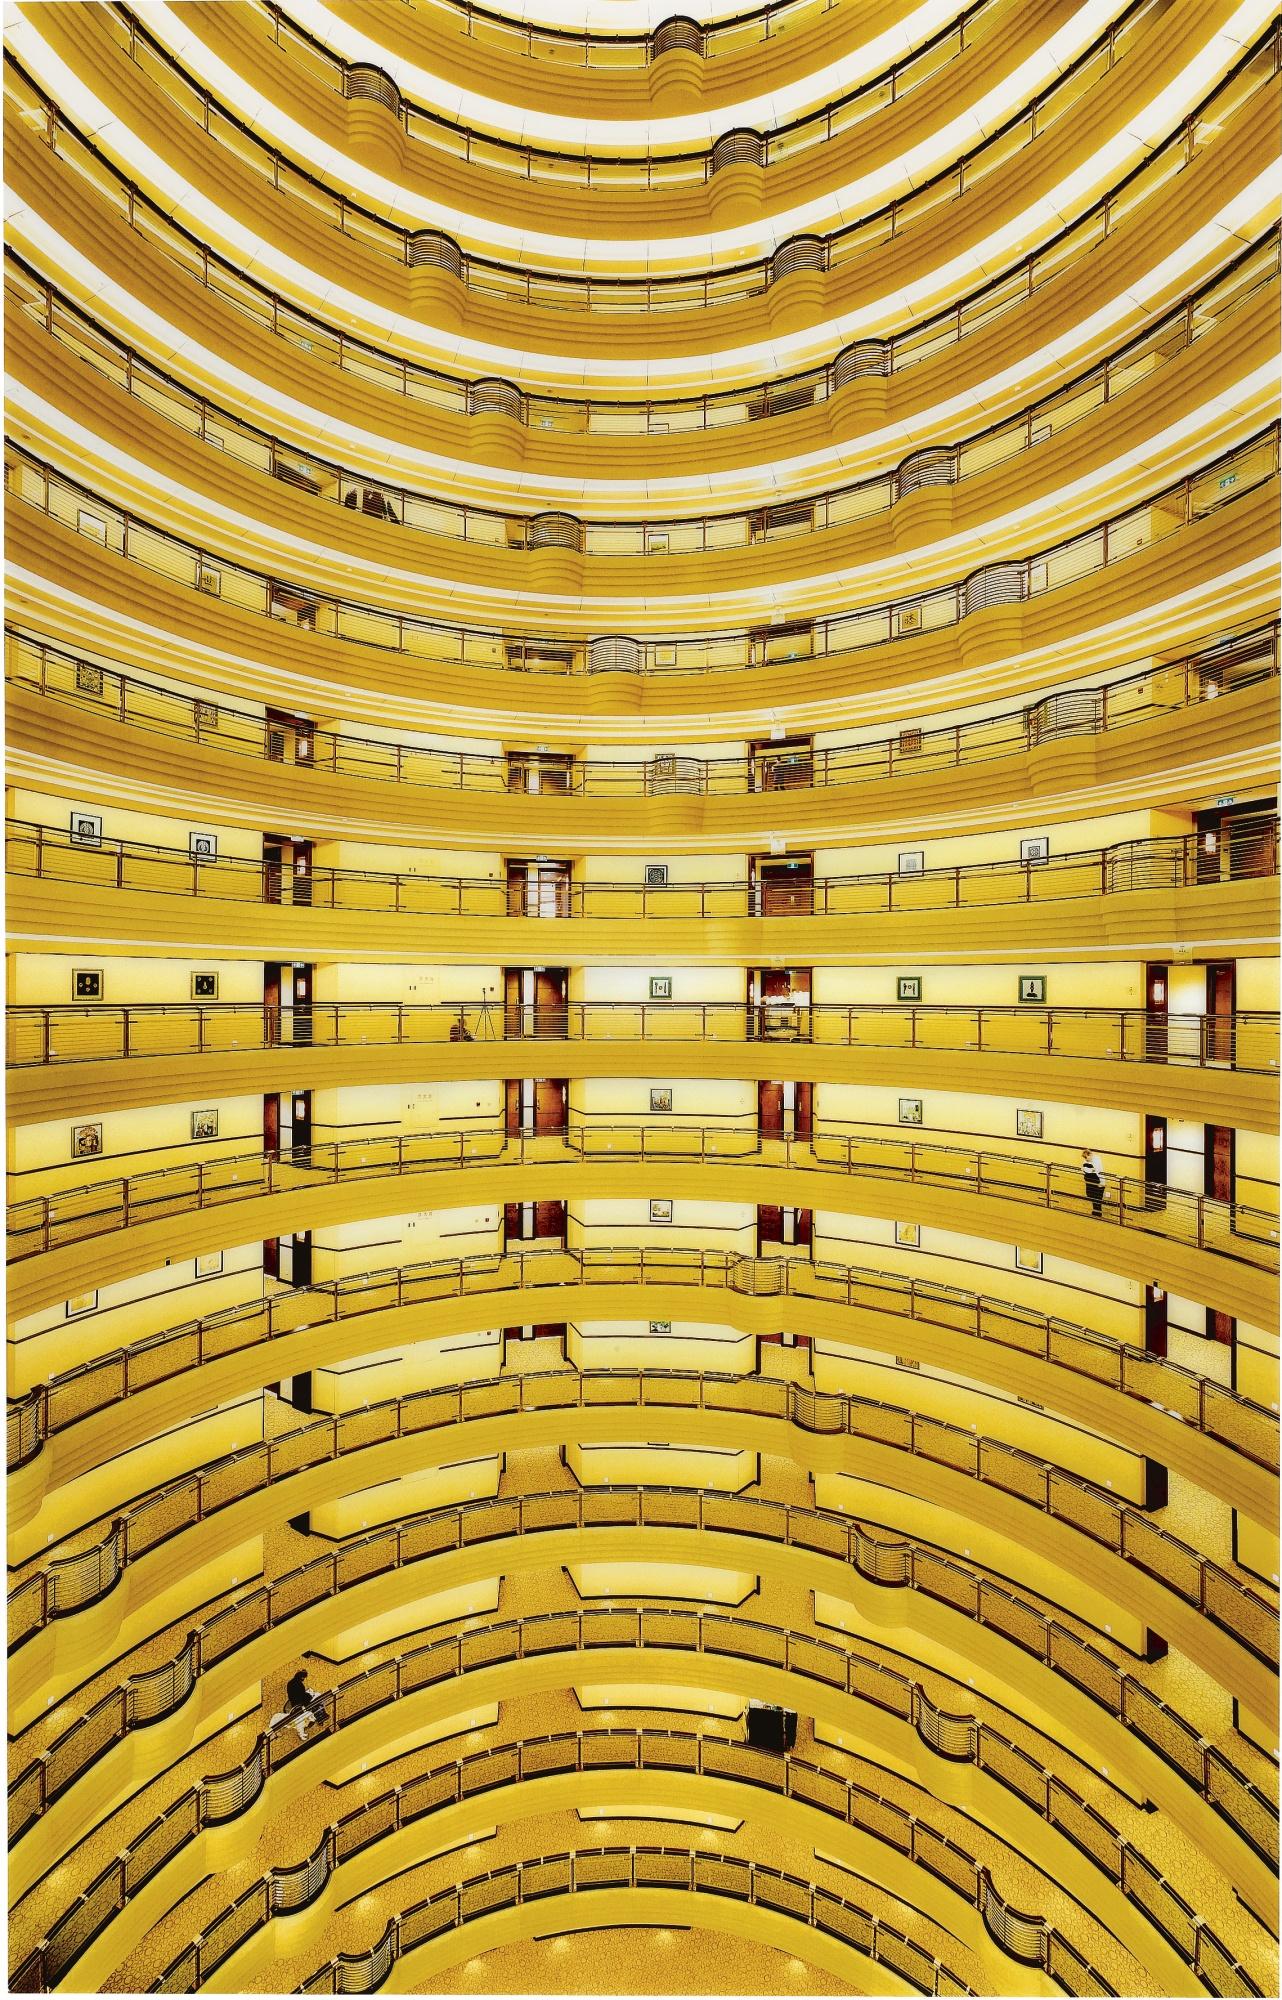 Andreas-Gursky-hyatt hotel-Shanghai2000-c-print